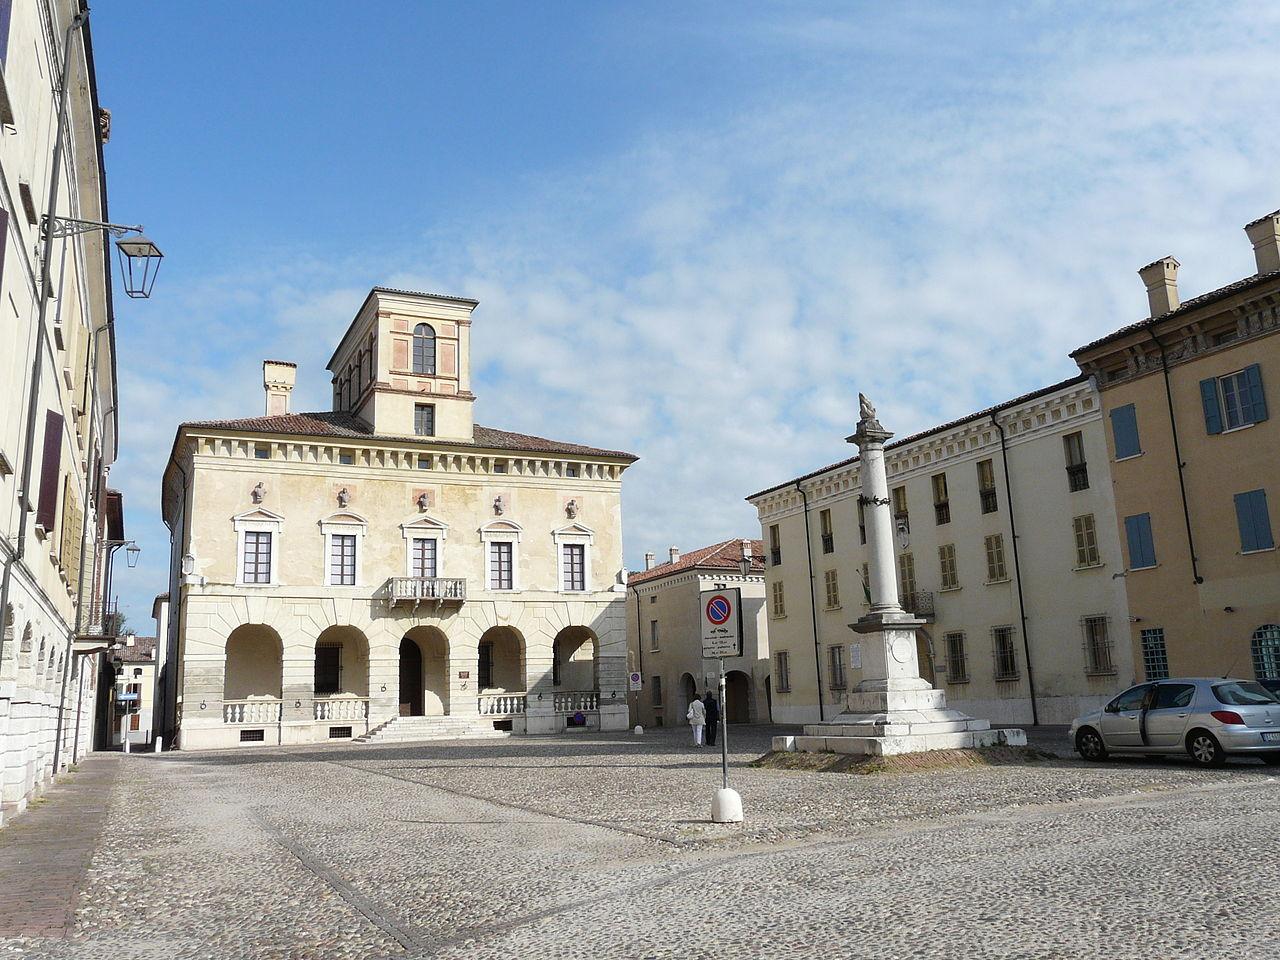 1280px-Sabbioneta-piazza_ducale[1]